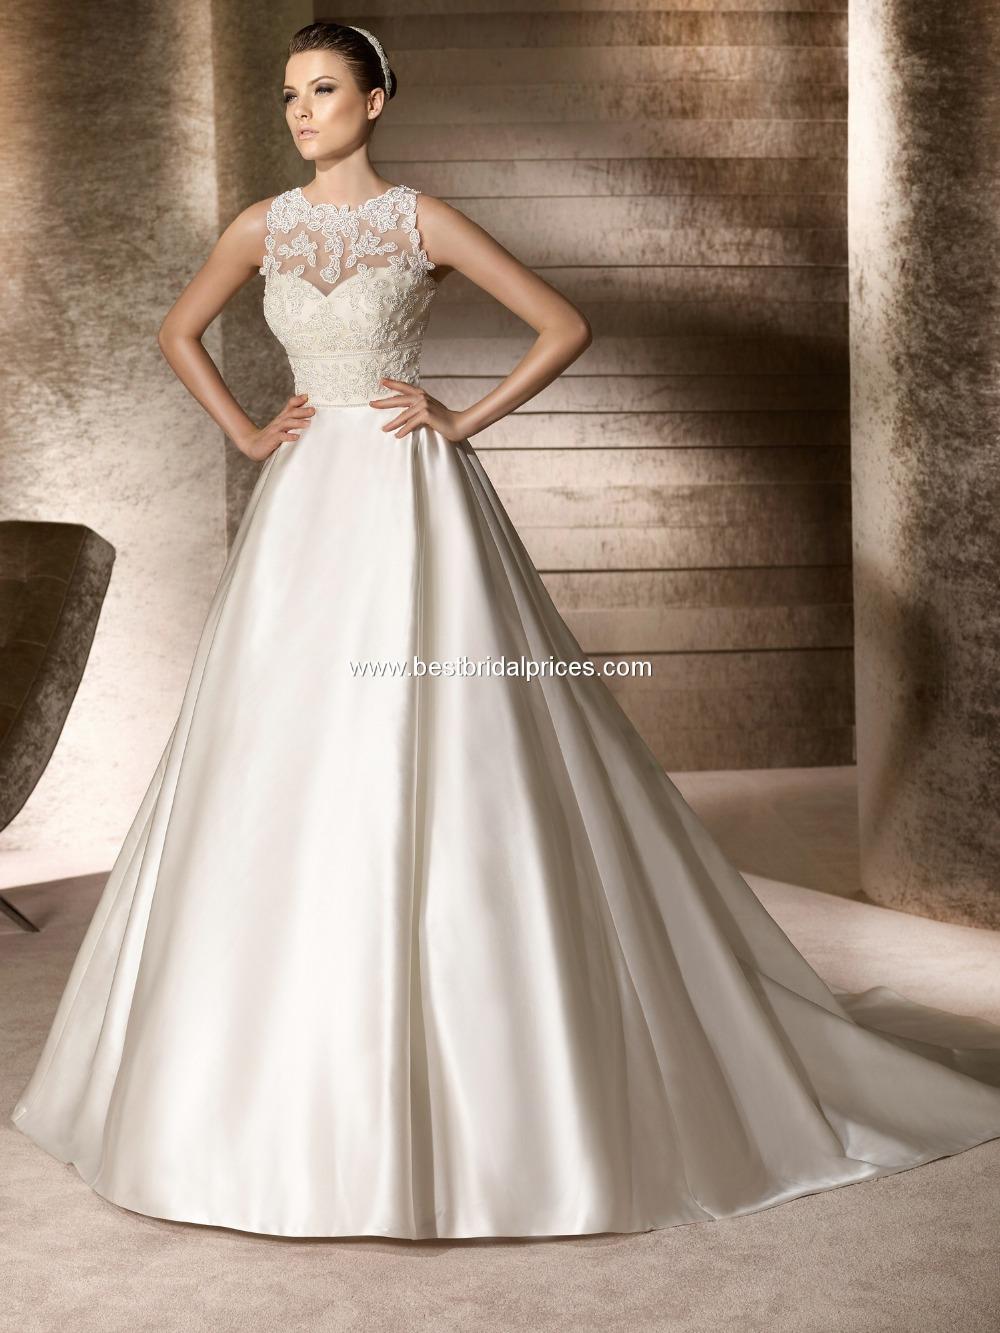 2016 New Arrival A line Royal Satin Elegant Wedding dress Tank Beading Generous Floor length Sweep(China (Mainland))